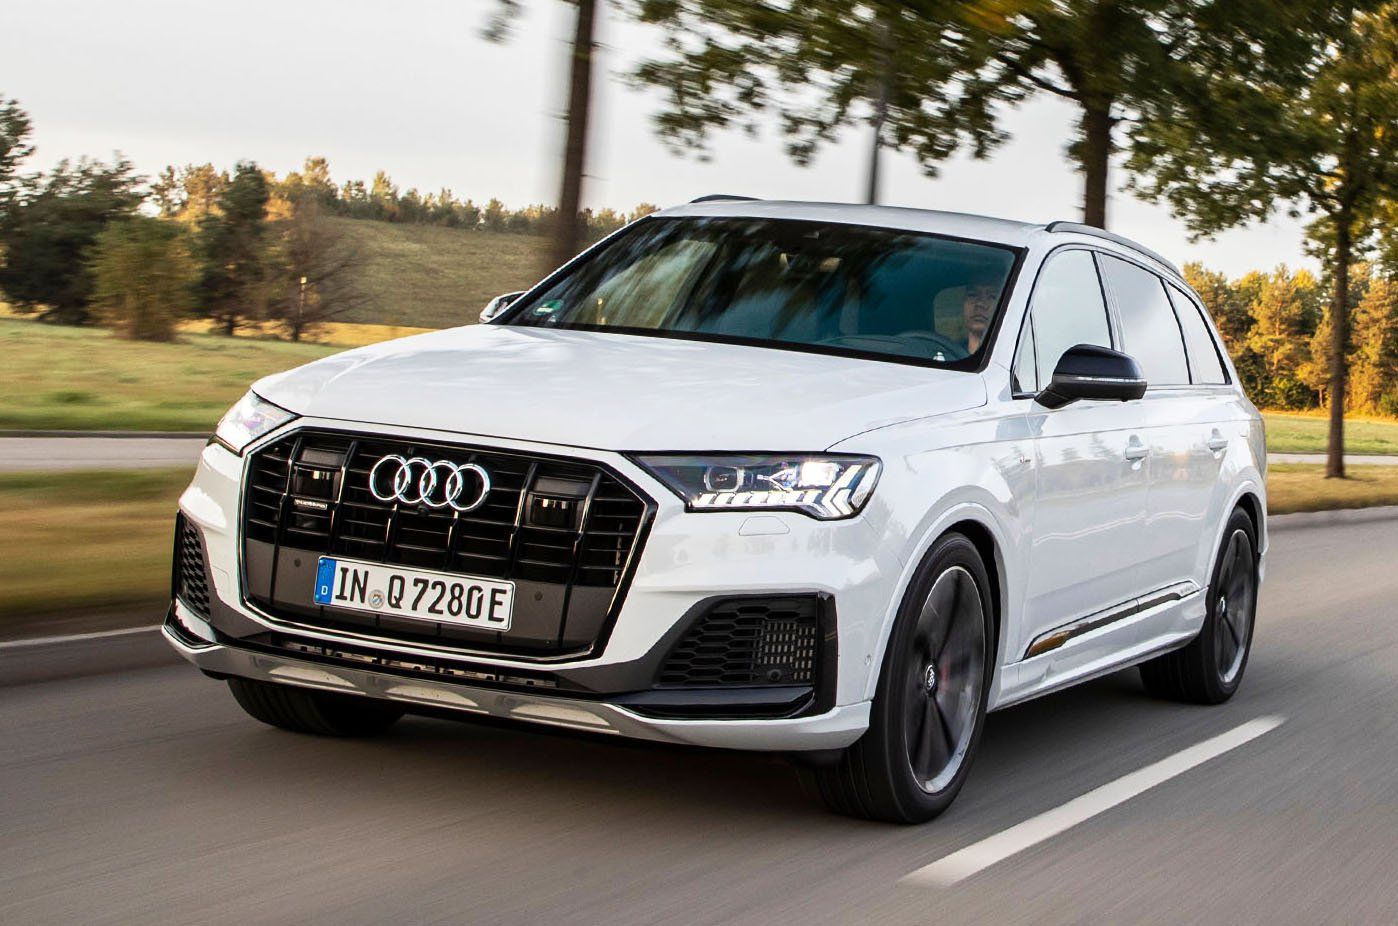 2020 Audi Q7 60 TFSIe front - white LHD car